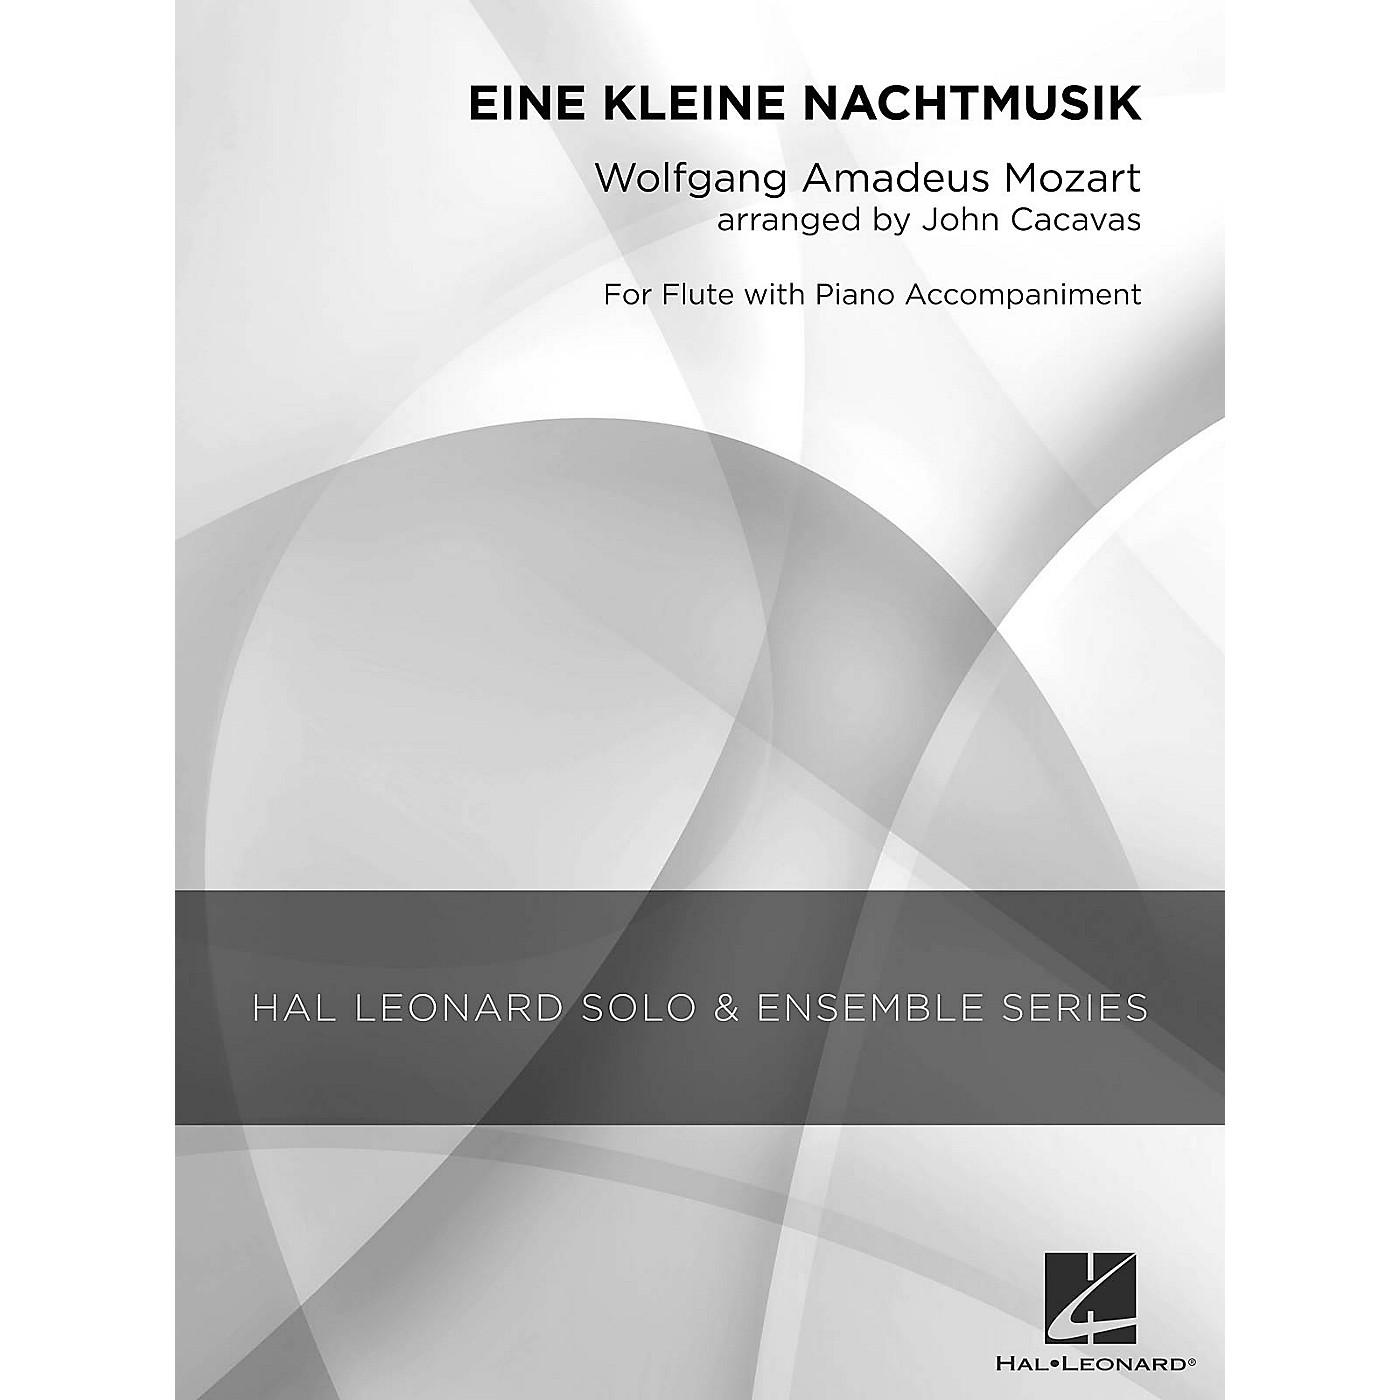 Hal Leonard Eine Kleine Nachtmusik (Grade 3 Flute Solo) Concert Band Level 3 Arranged by John Cacavas thumbnail